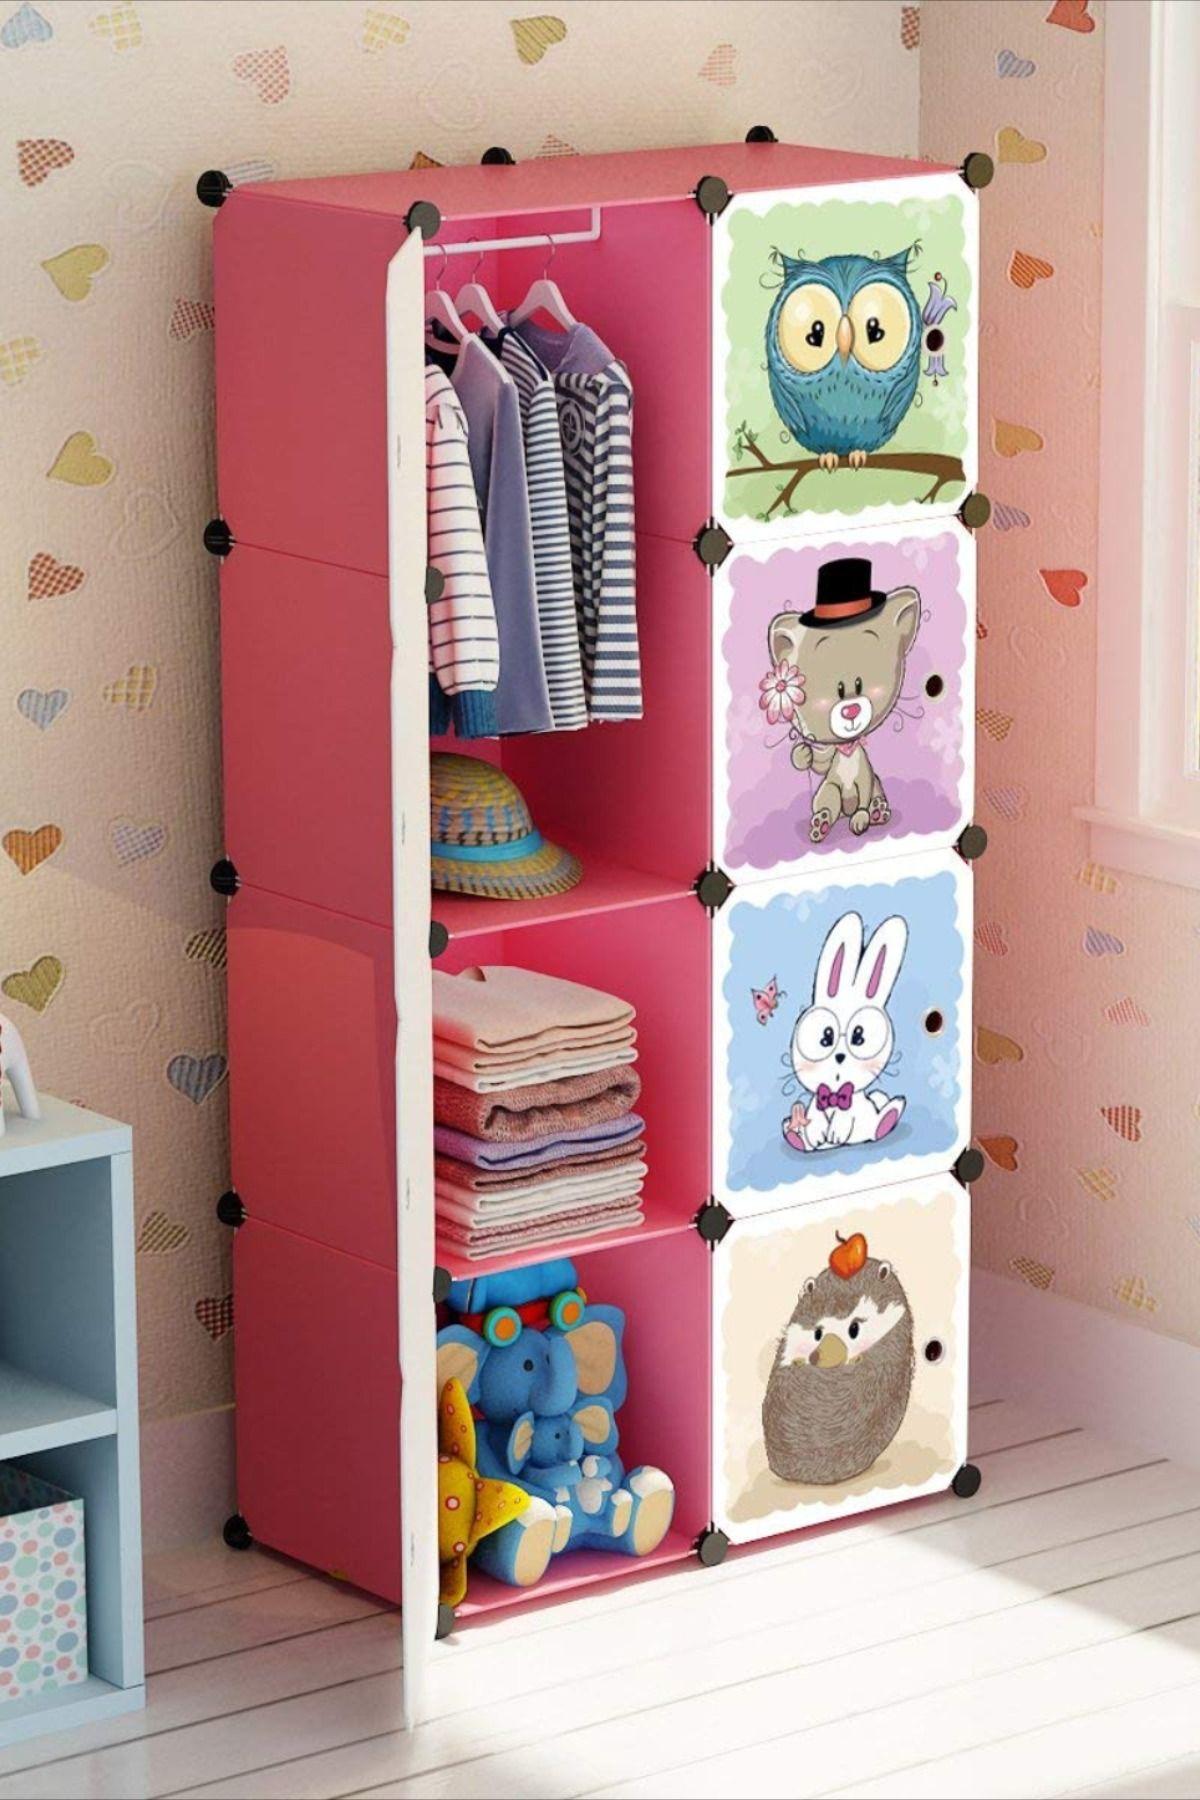 Portable Kid Organizers And Cute Baby Storage Organizer Clothes Wardrobe Cube Closet Multifuncation Baby Storage Cubes Closet Organization Kids